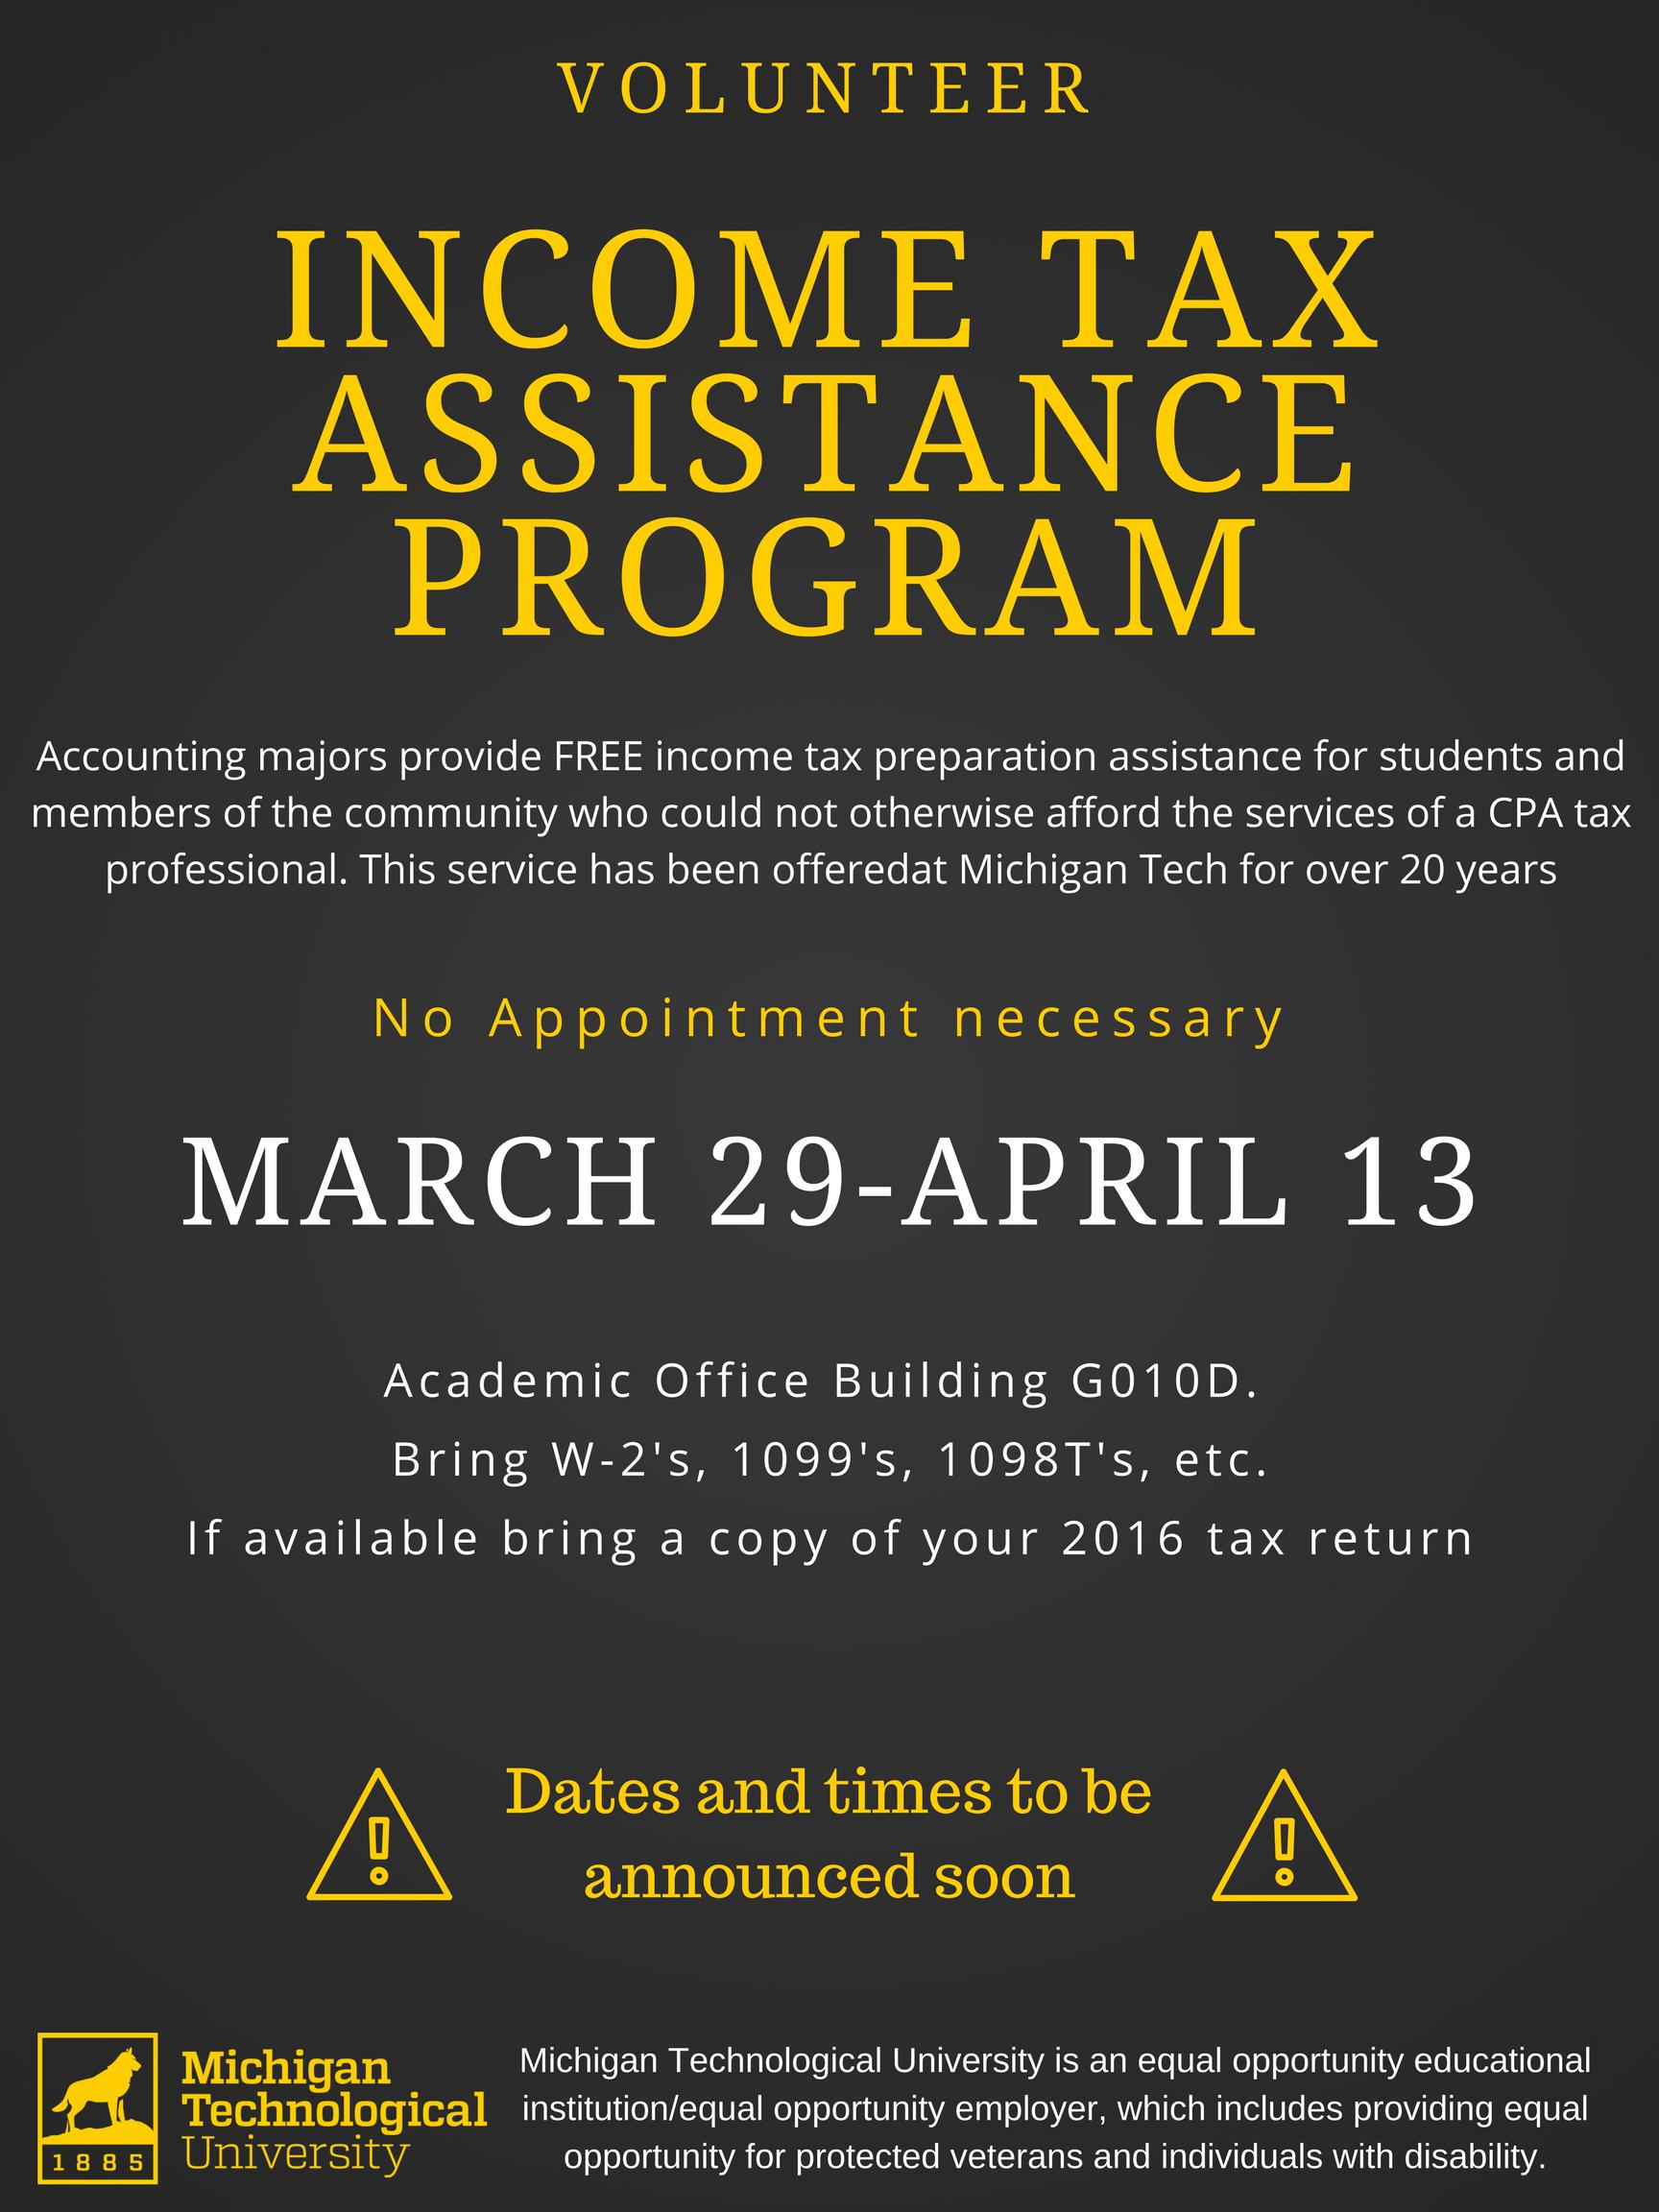 Volunteer Incoming Tax assistance Program